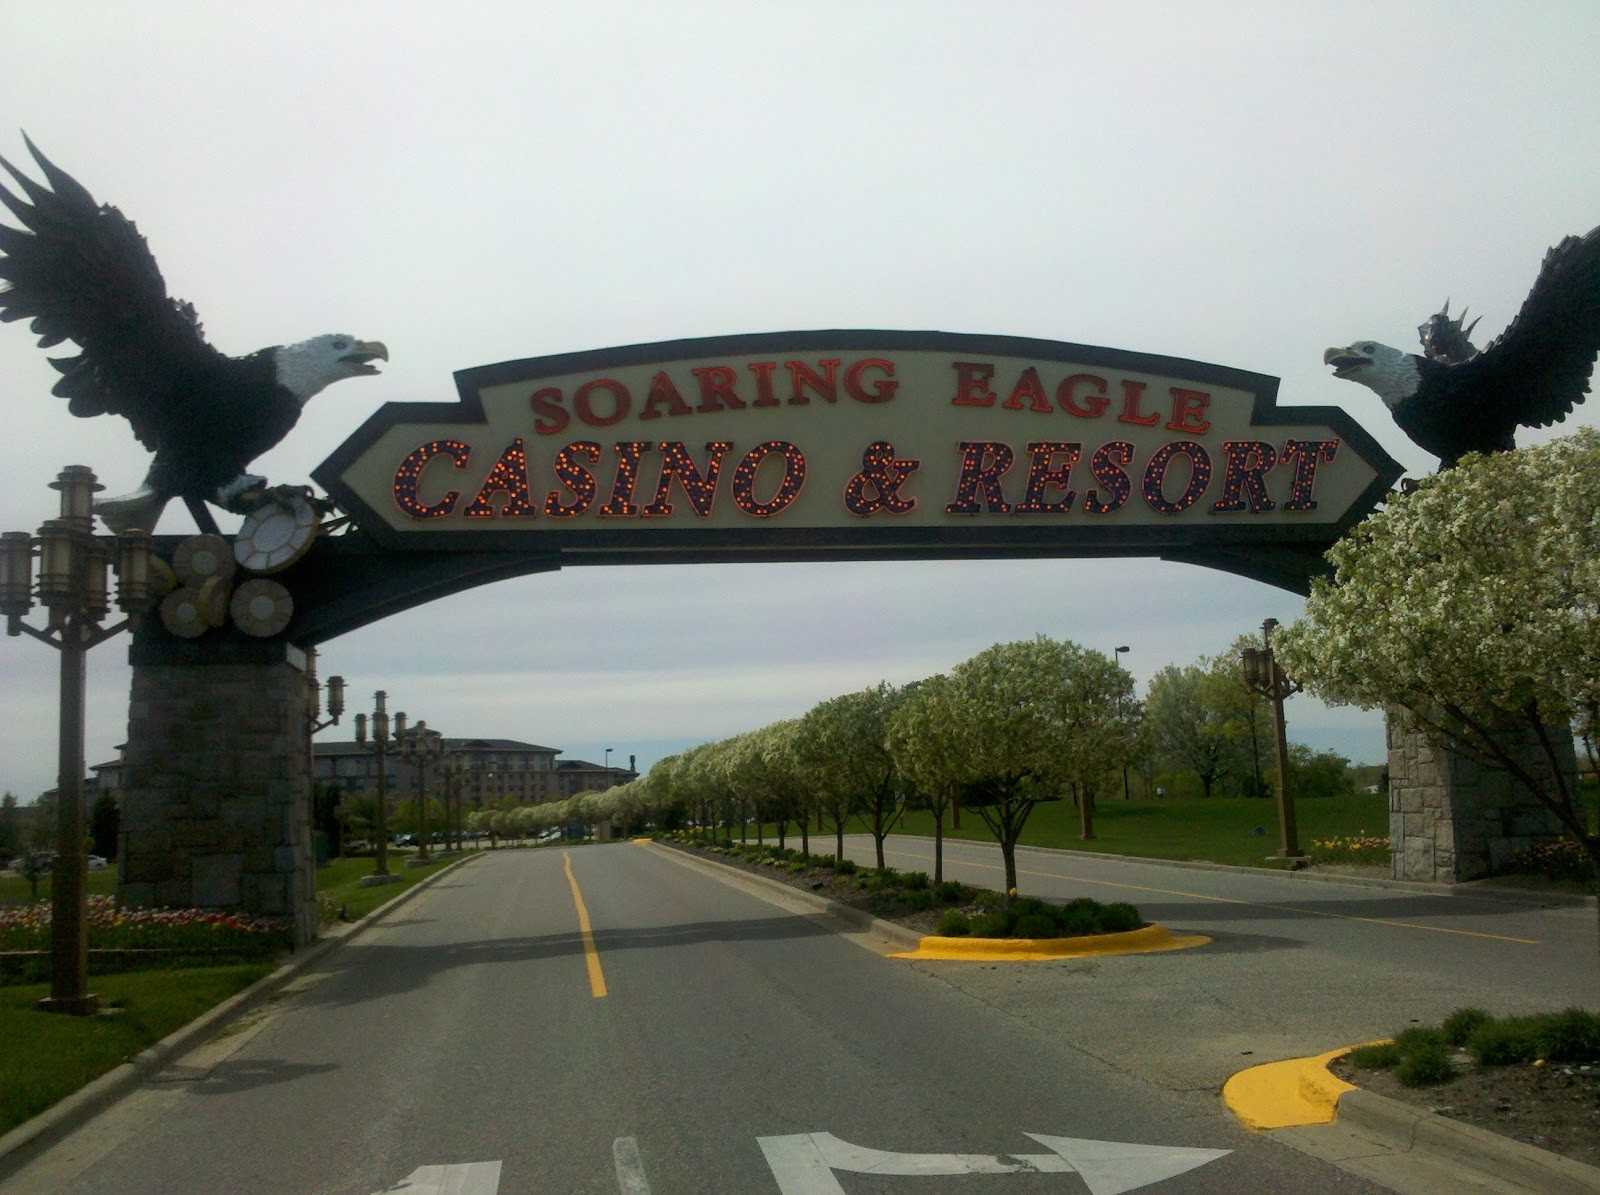 Mt pleasant casino bingo